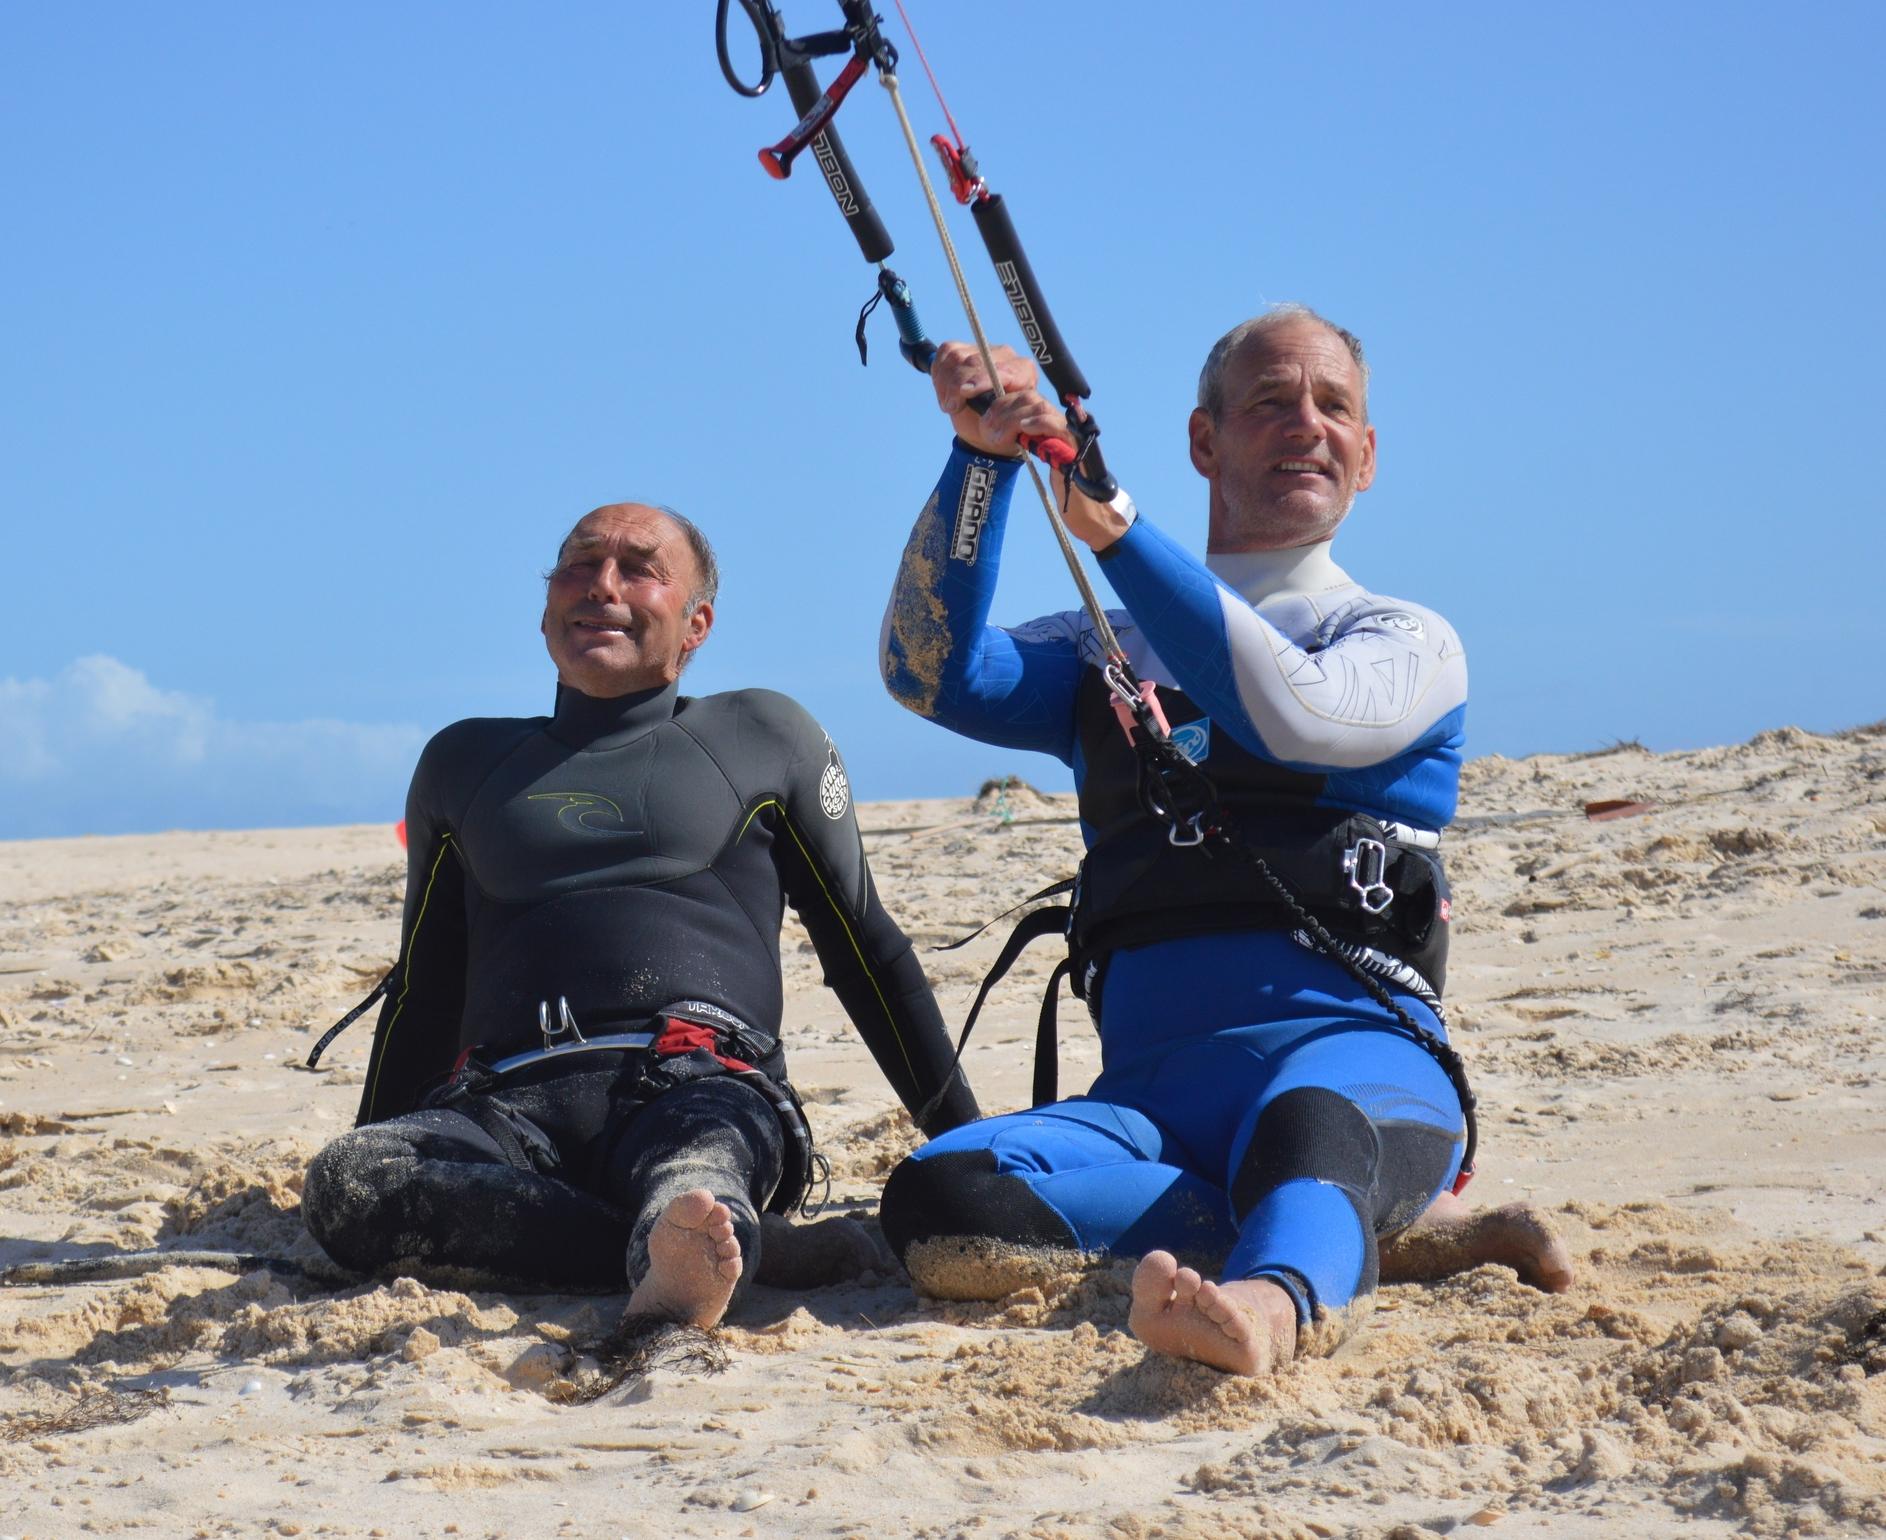 Having a break from Kitesurfing - Fuzeta Beach